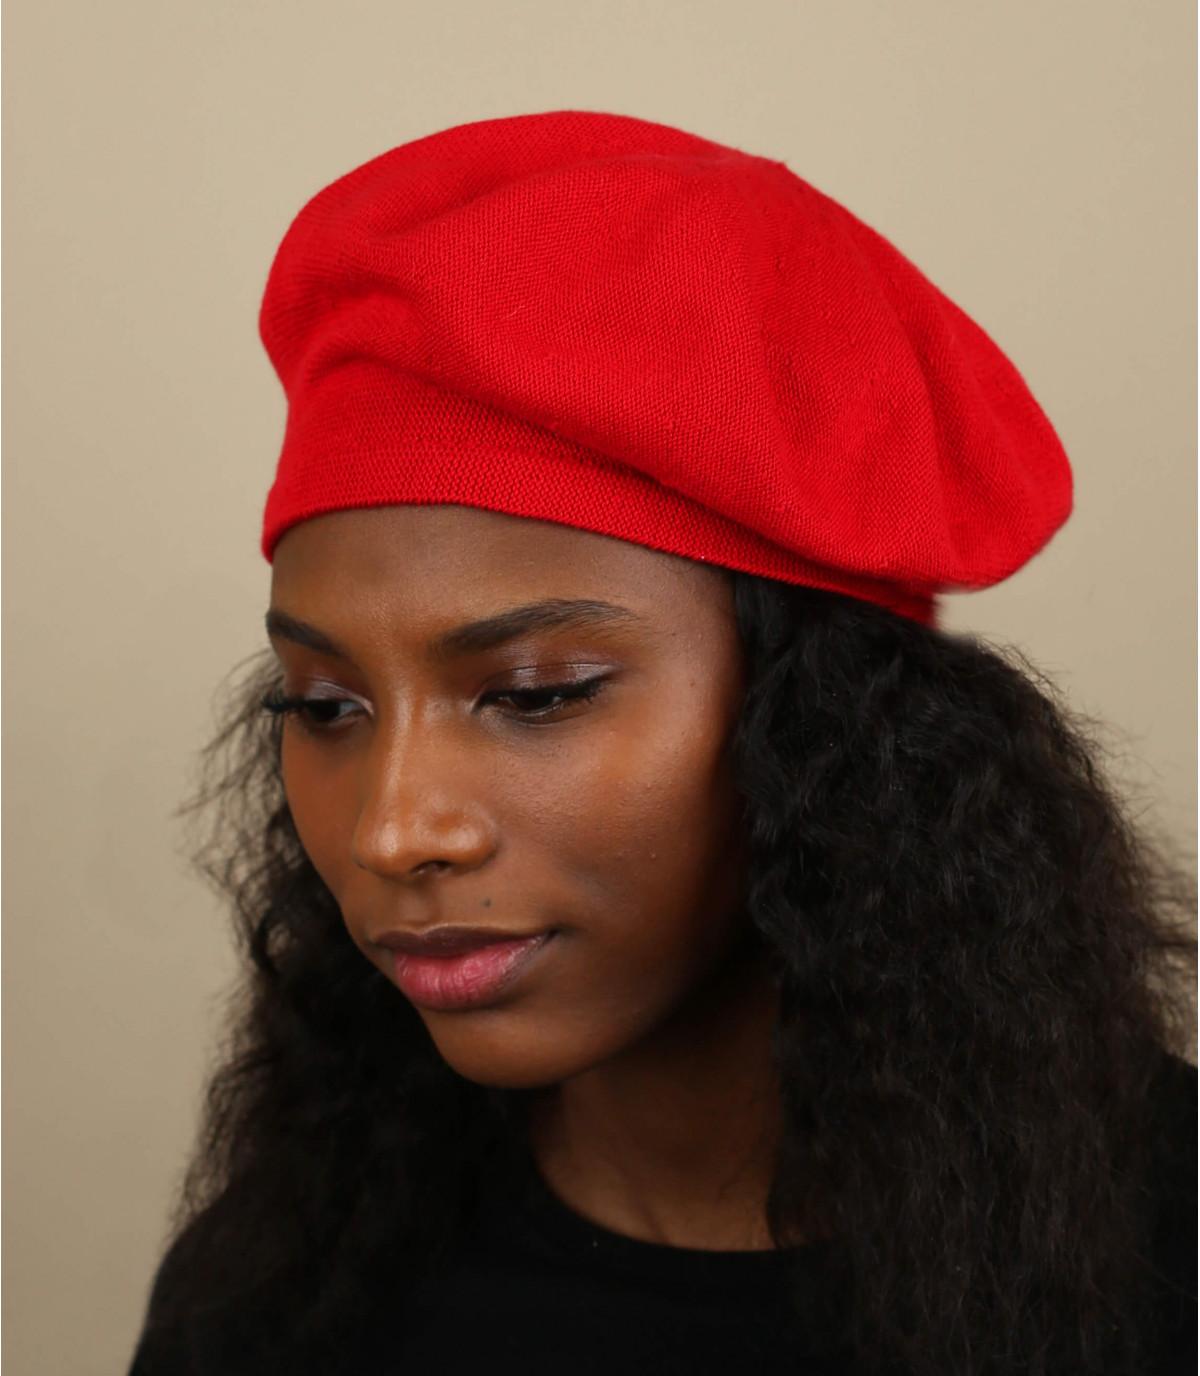 rode baret vallen Laulhère